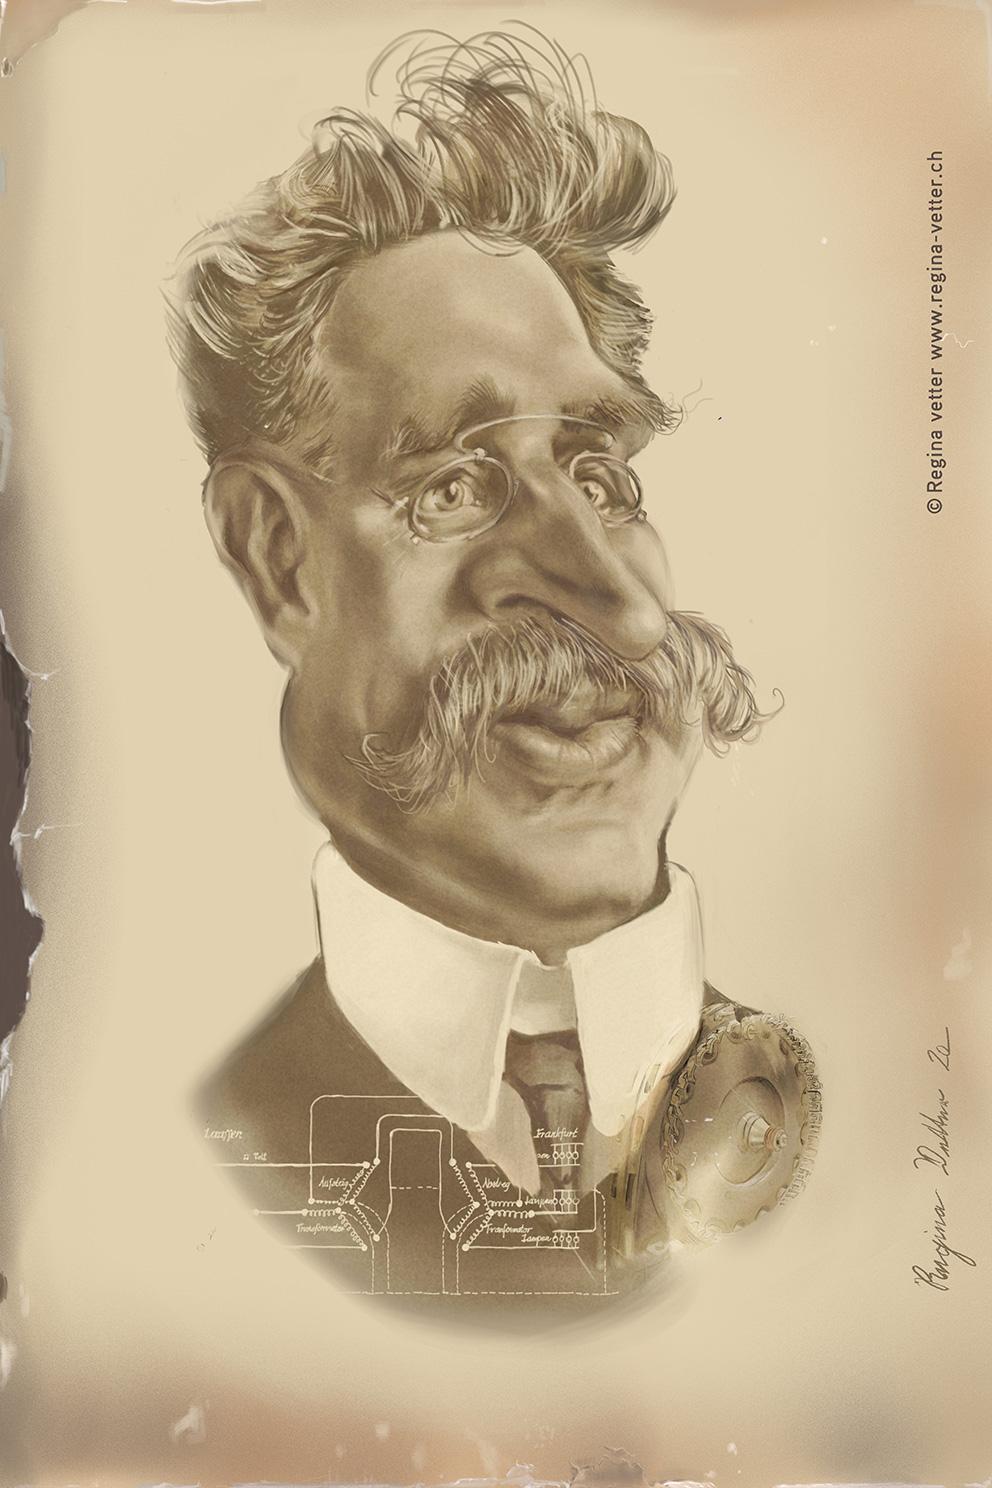 Charles E L. Brown